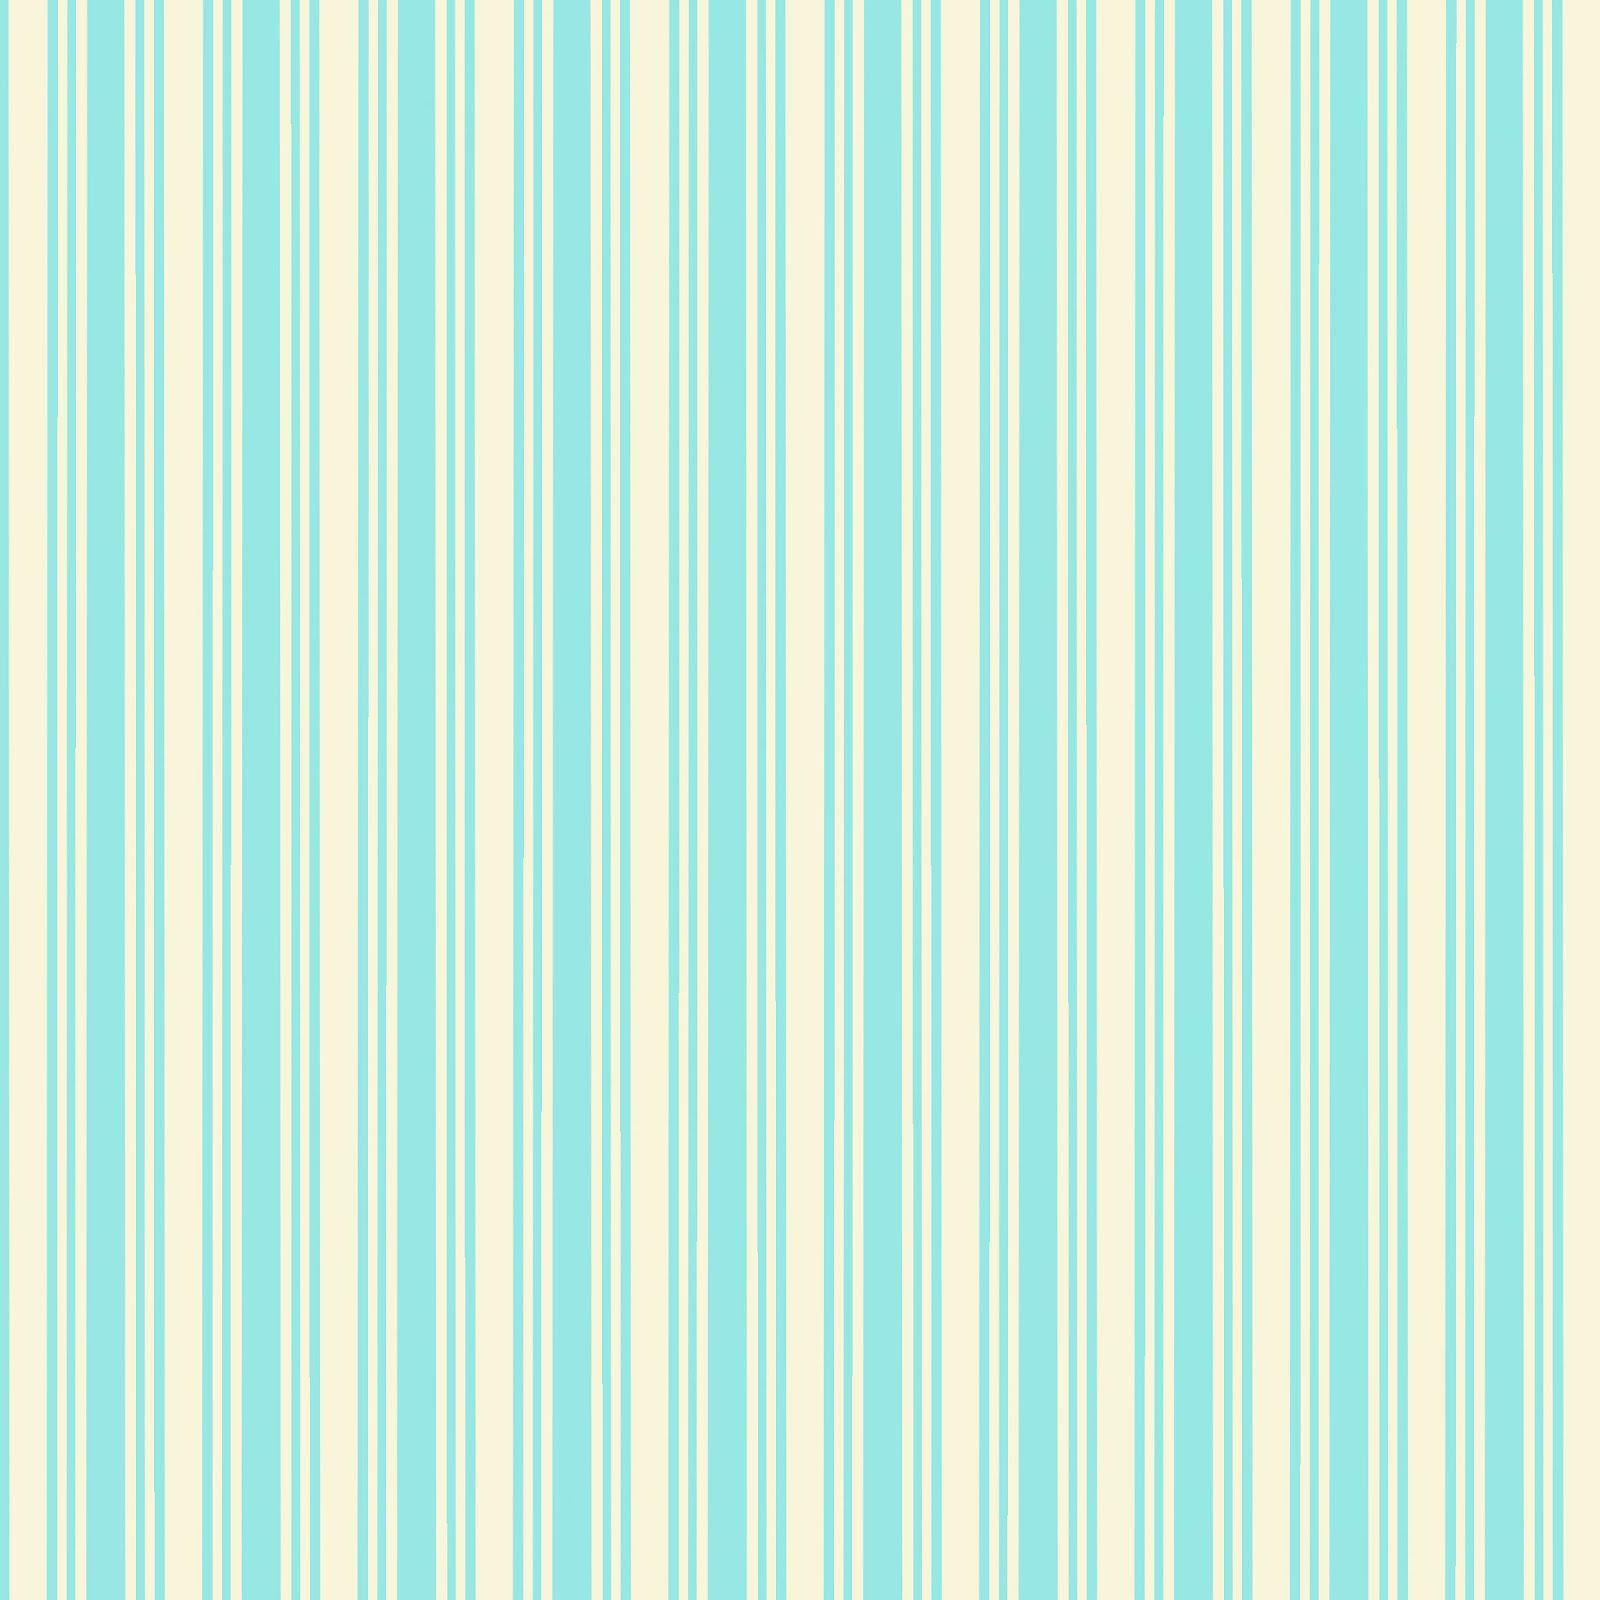 Patterns print floral grey stripes Commercial use. Printable pages Scrapbook paper old retro Blue Vintage digital paper pack cream